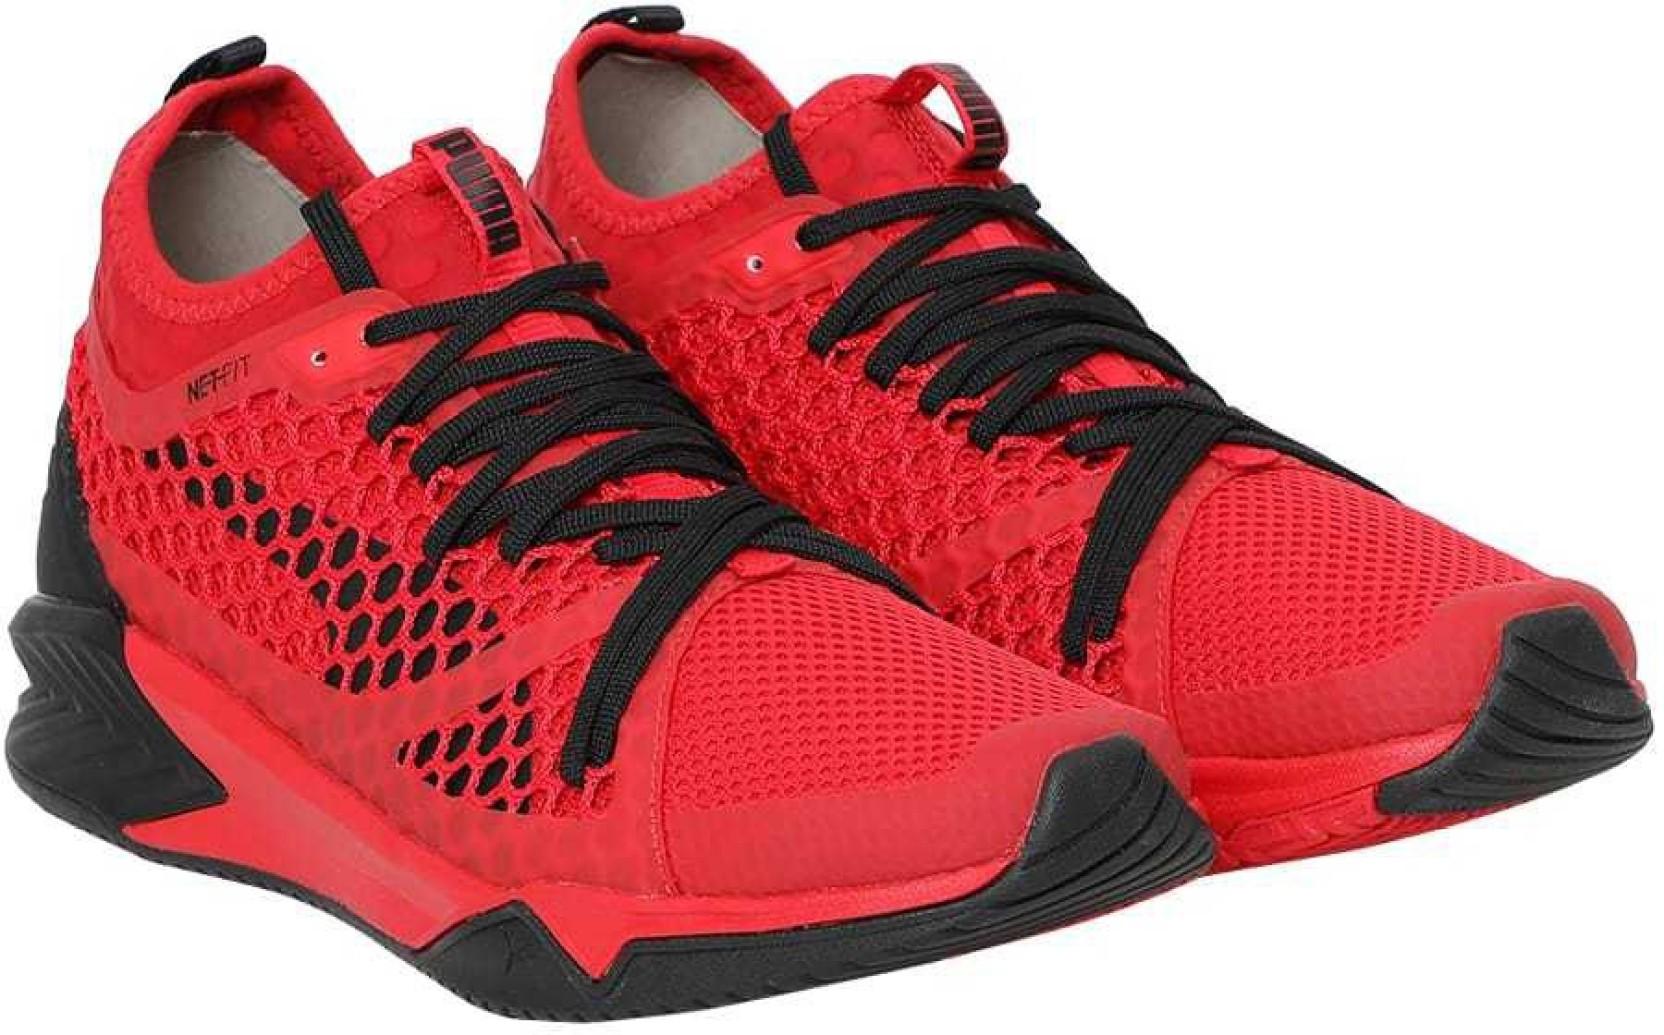 b70a354a4a3 Puma IGNITE XT NETFIT Walking Shoes For Men - Buy Puma IGNITE XT ...